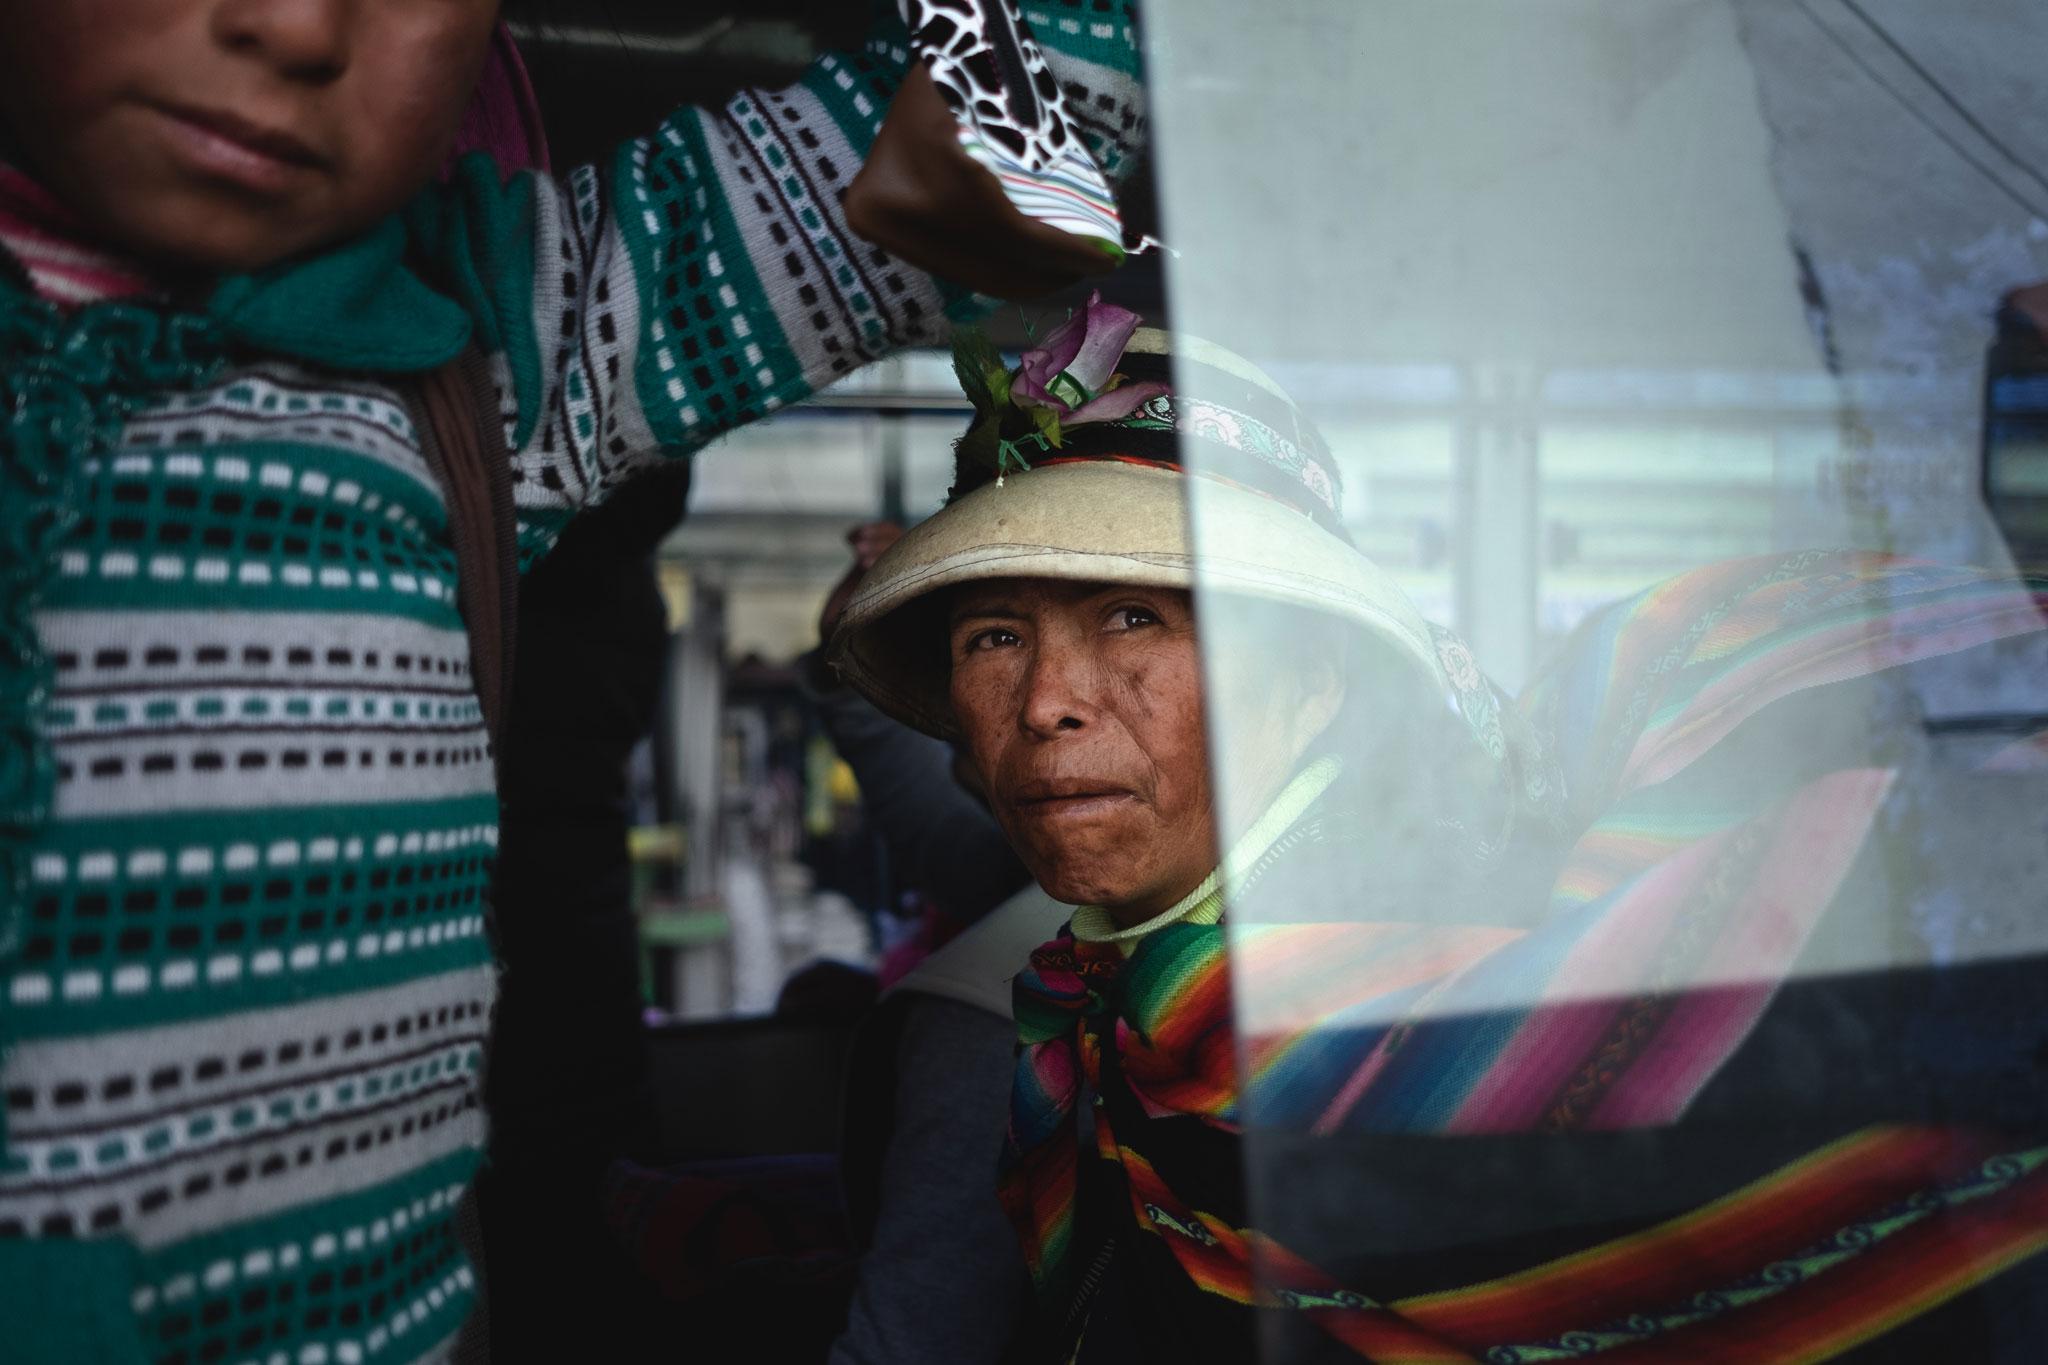 quechua-woman-bus-cusco